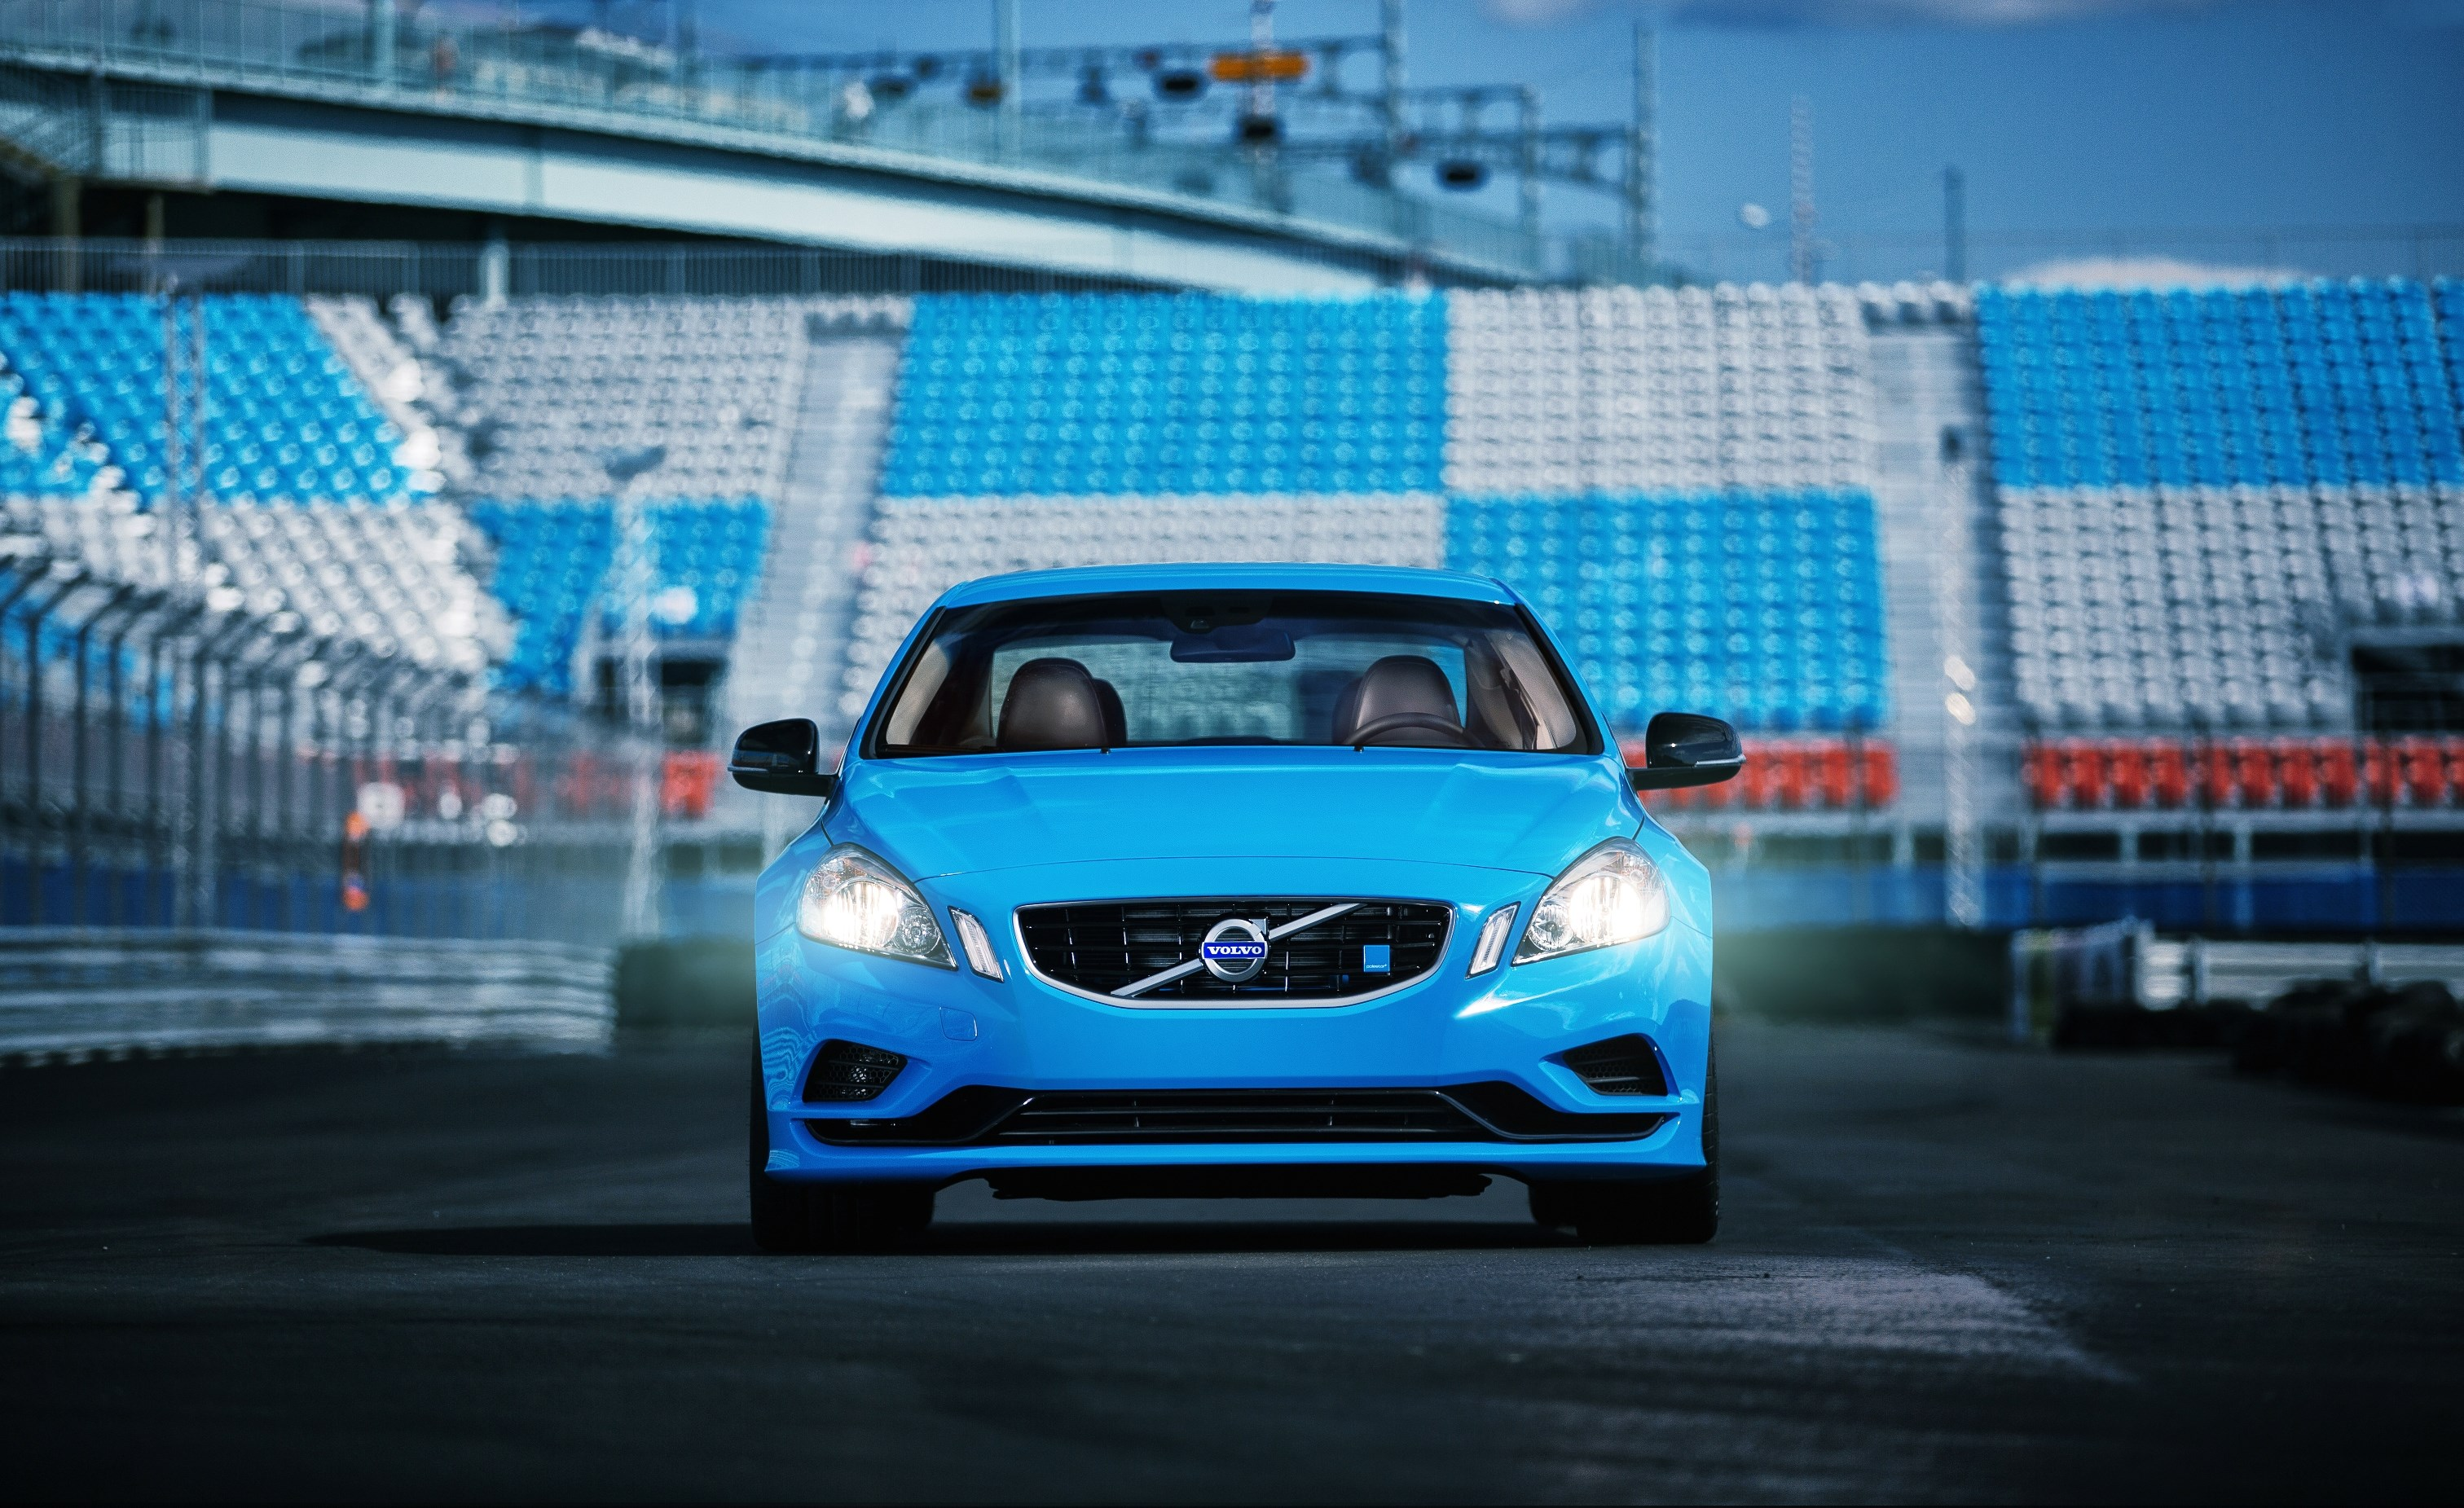 47483_Volvo_S60_Polestar_Concept